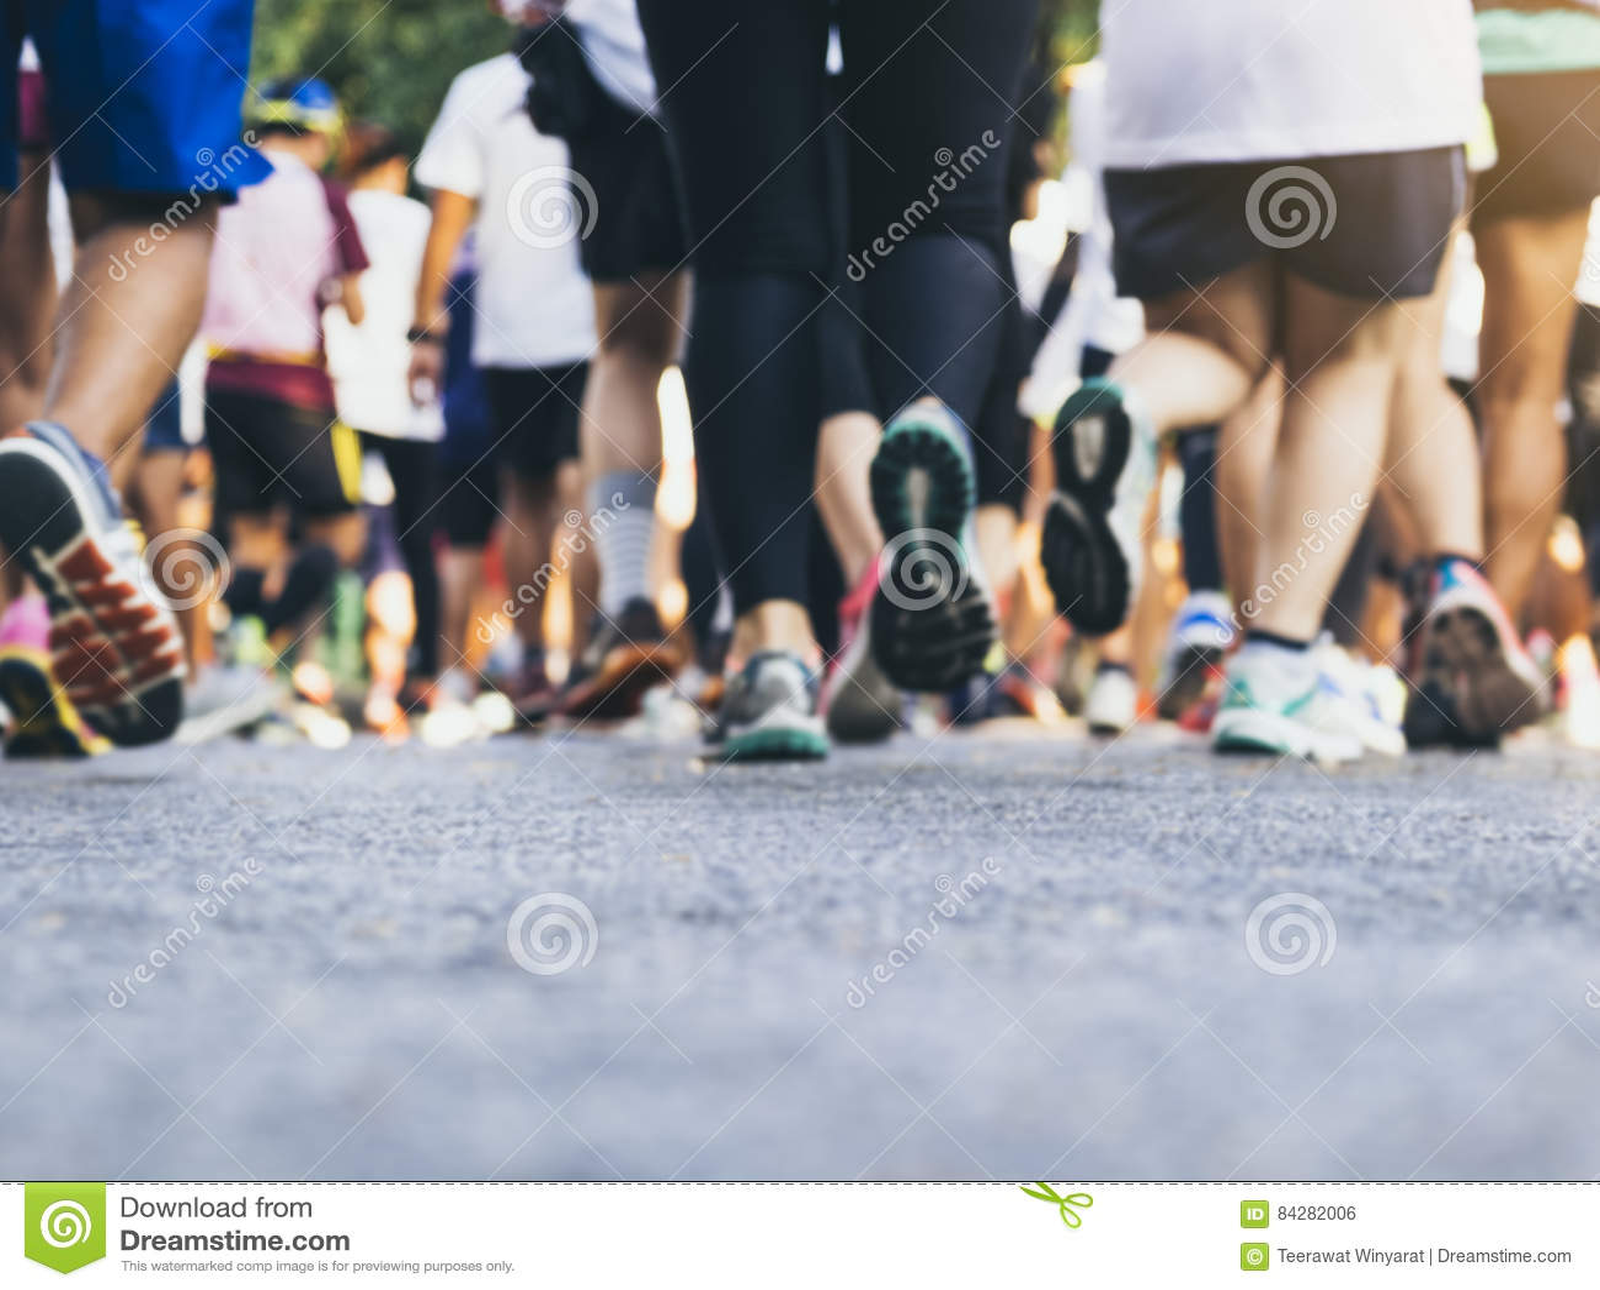 Marathon runners Group People running Outdoor Sport Event